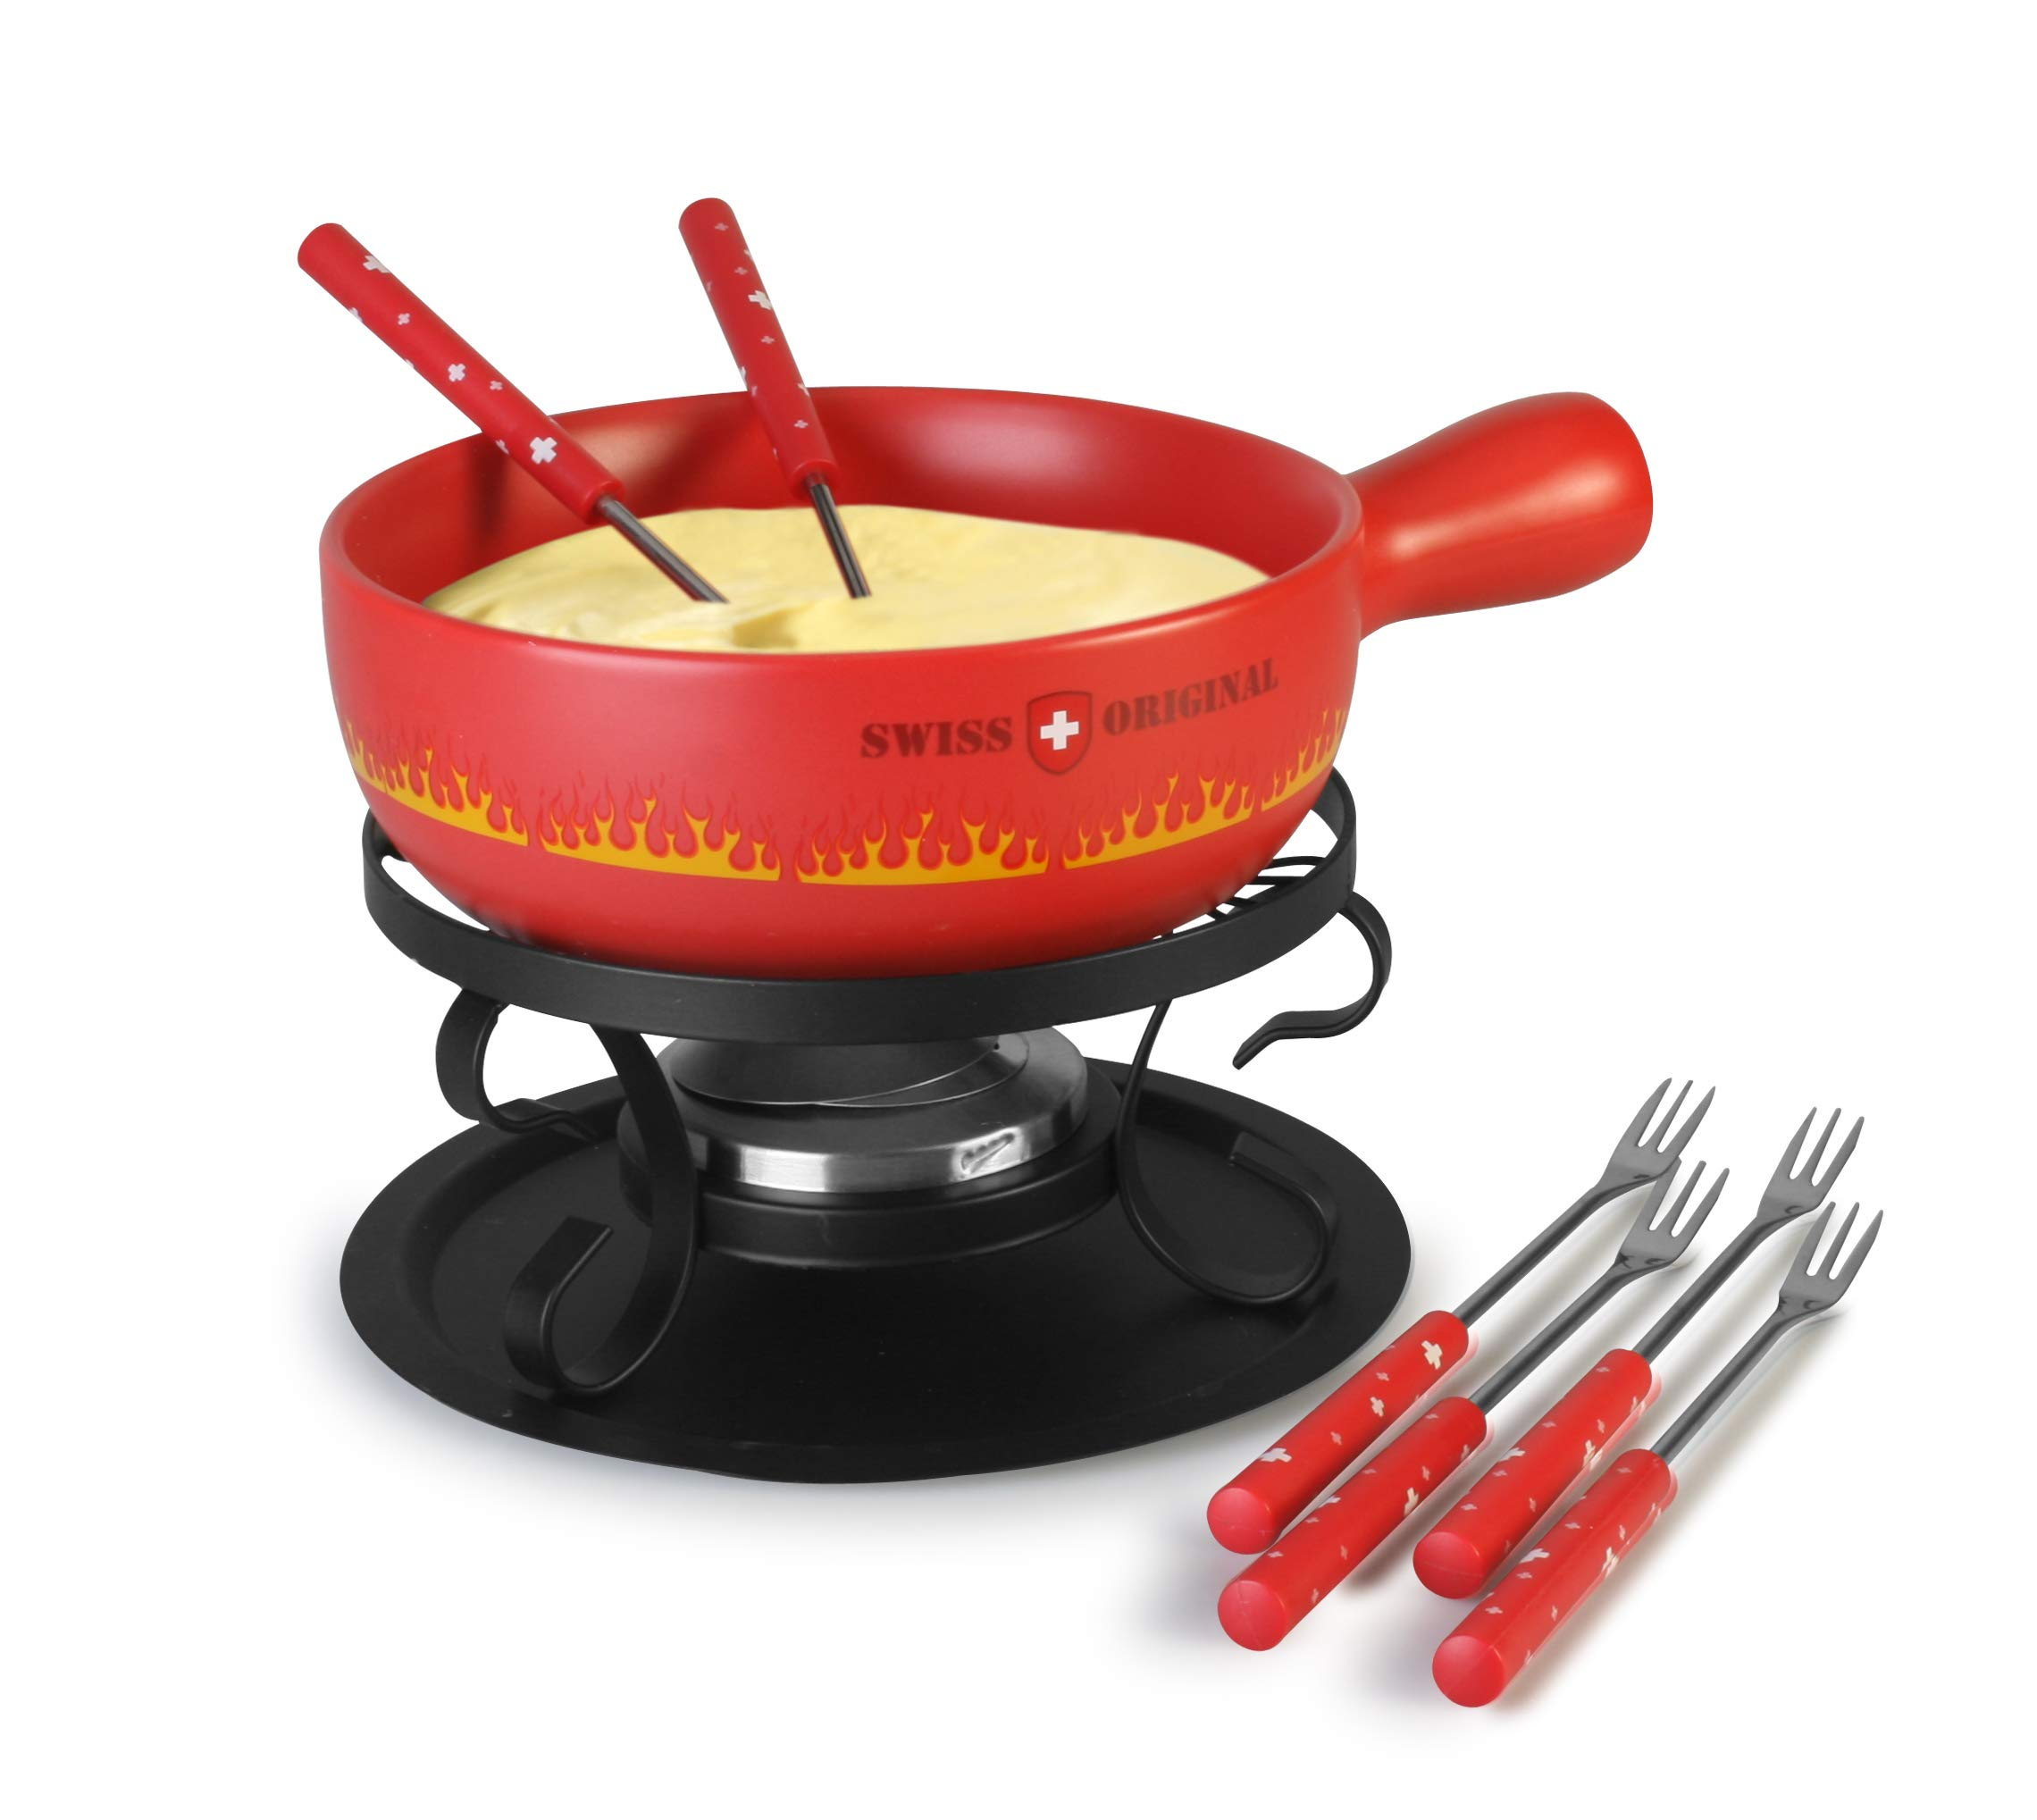 Artestia Ceramic Cheese Fondue Cooking Pot - Swiss Flare (Fondue Set - Red)